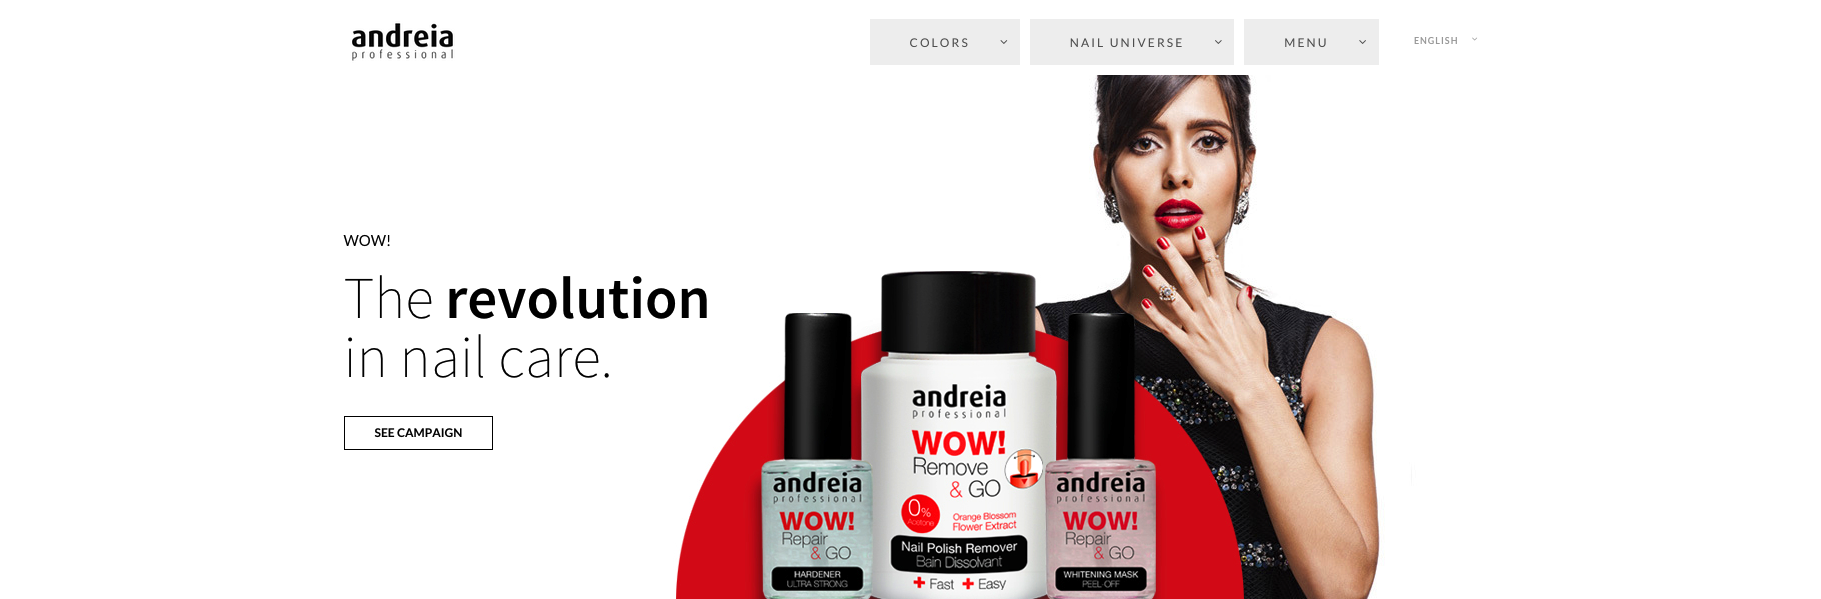 Andreia_Professional-4